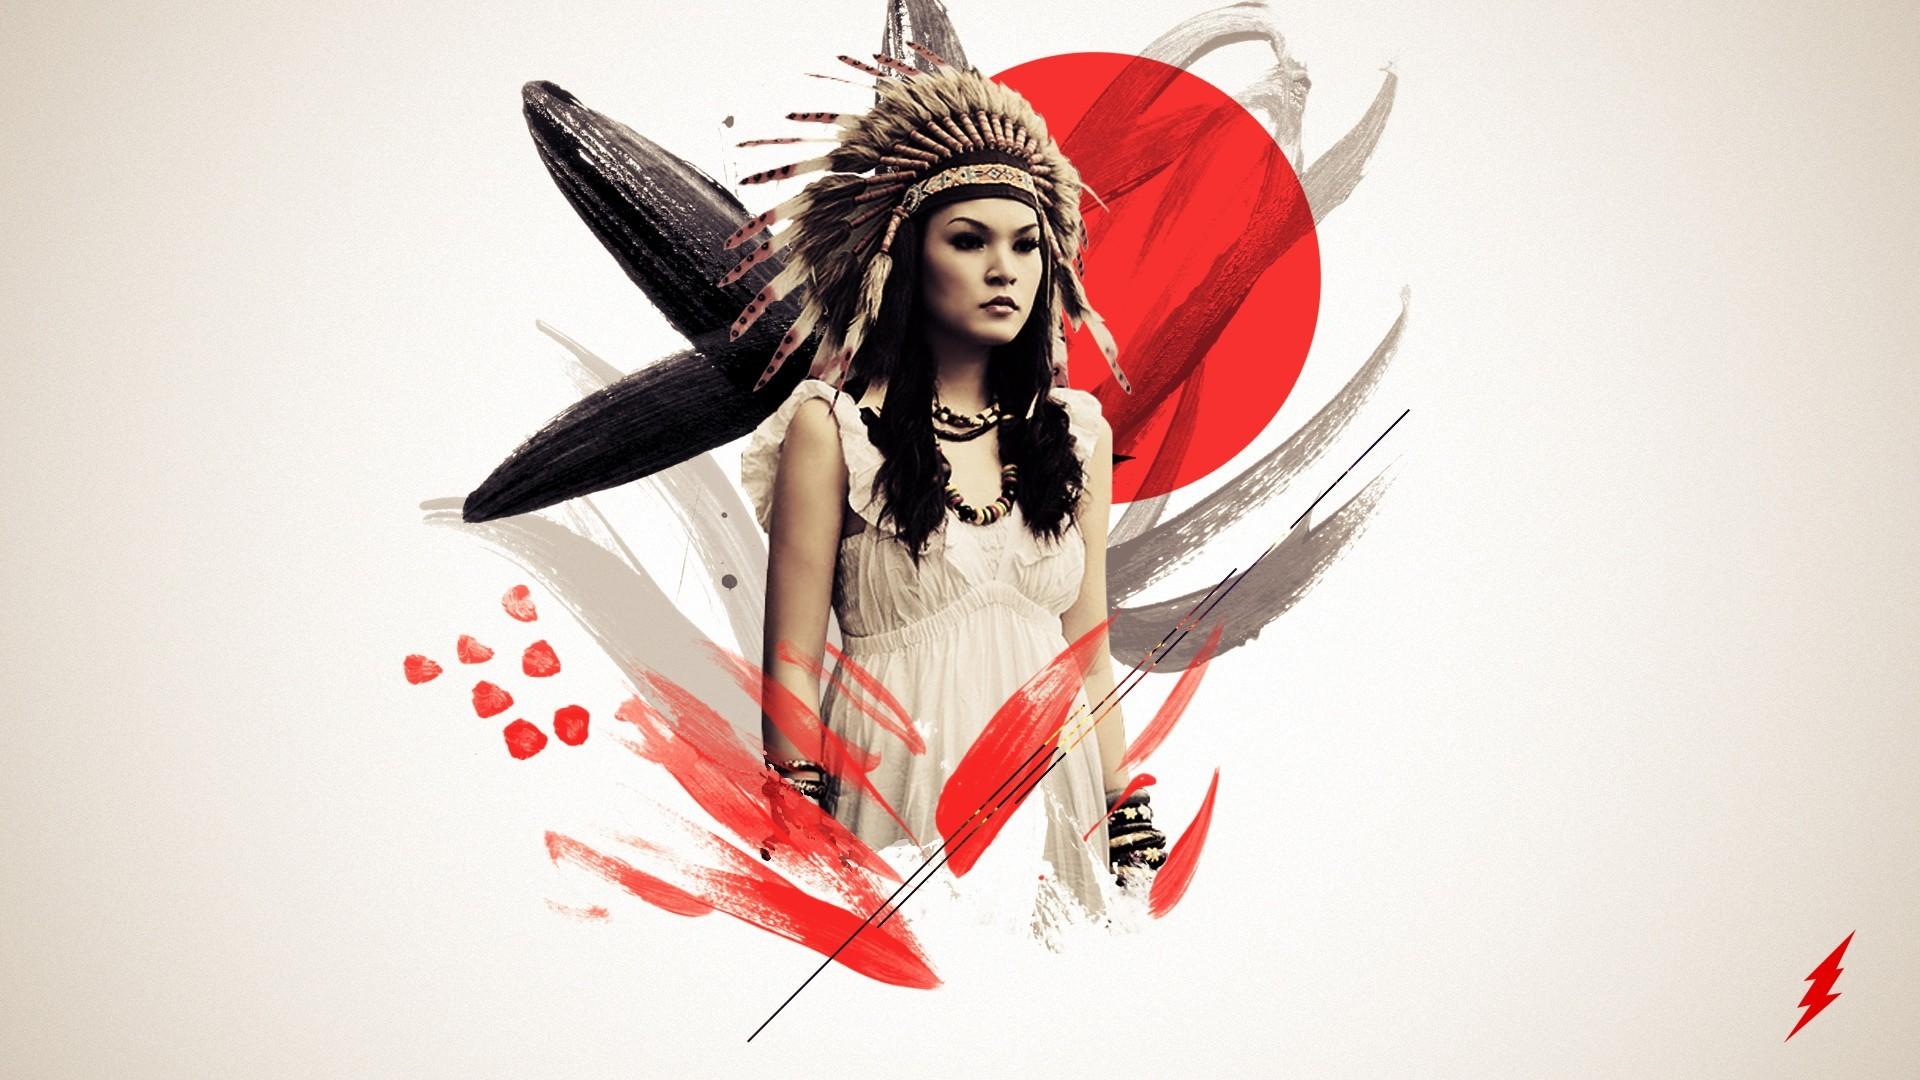 artistic native american Wallpaper Backgrounds